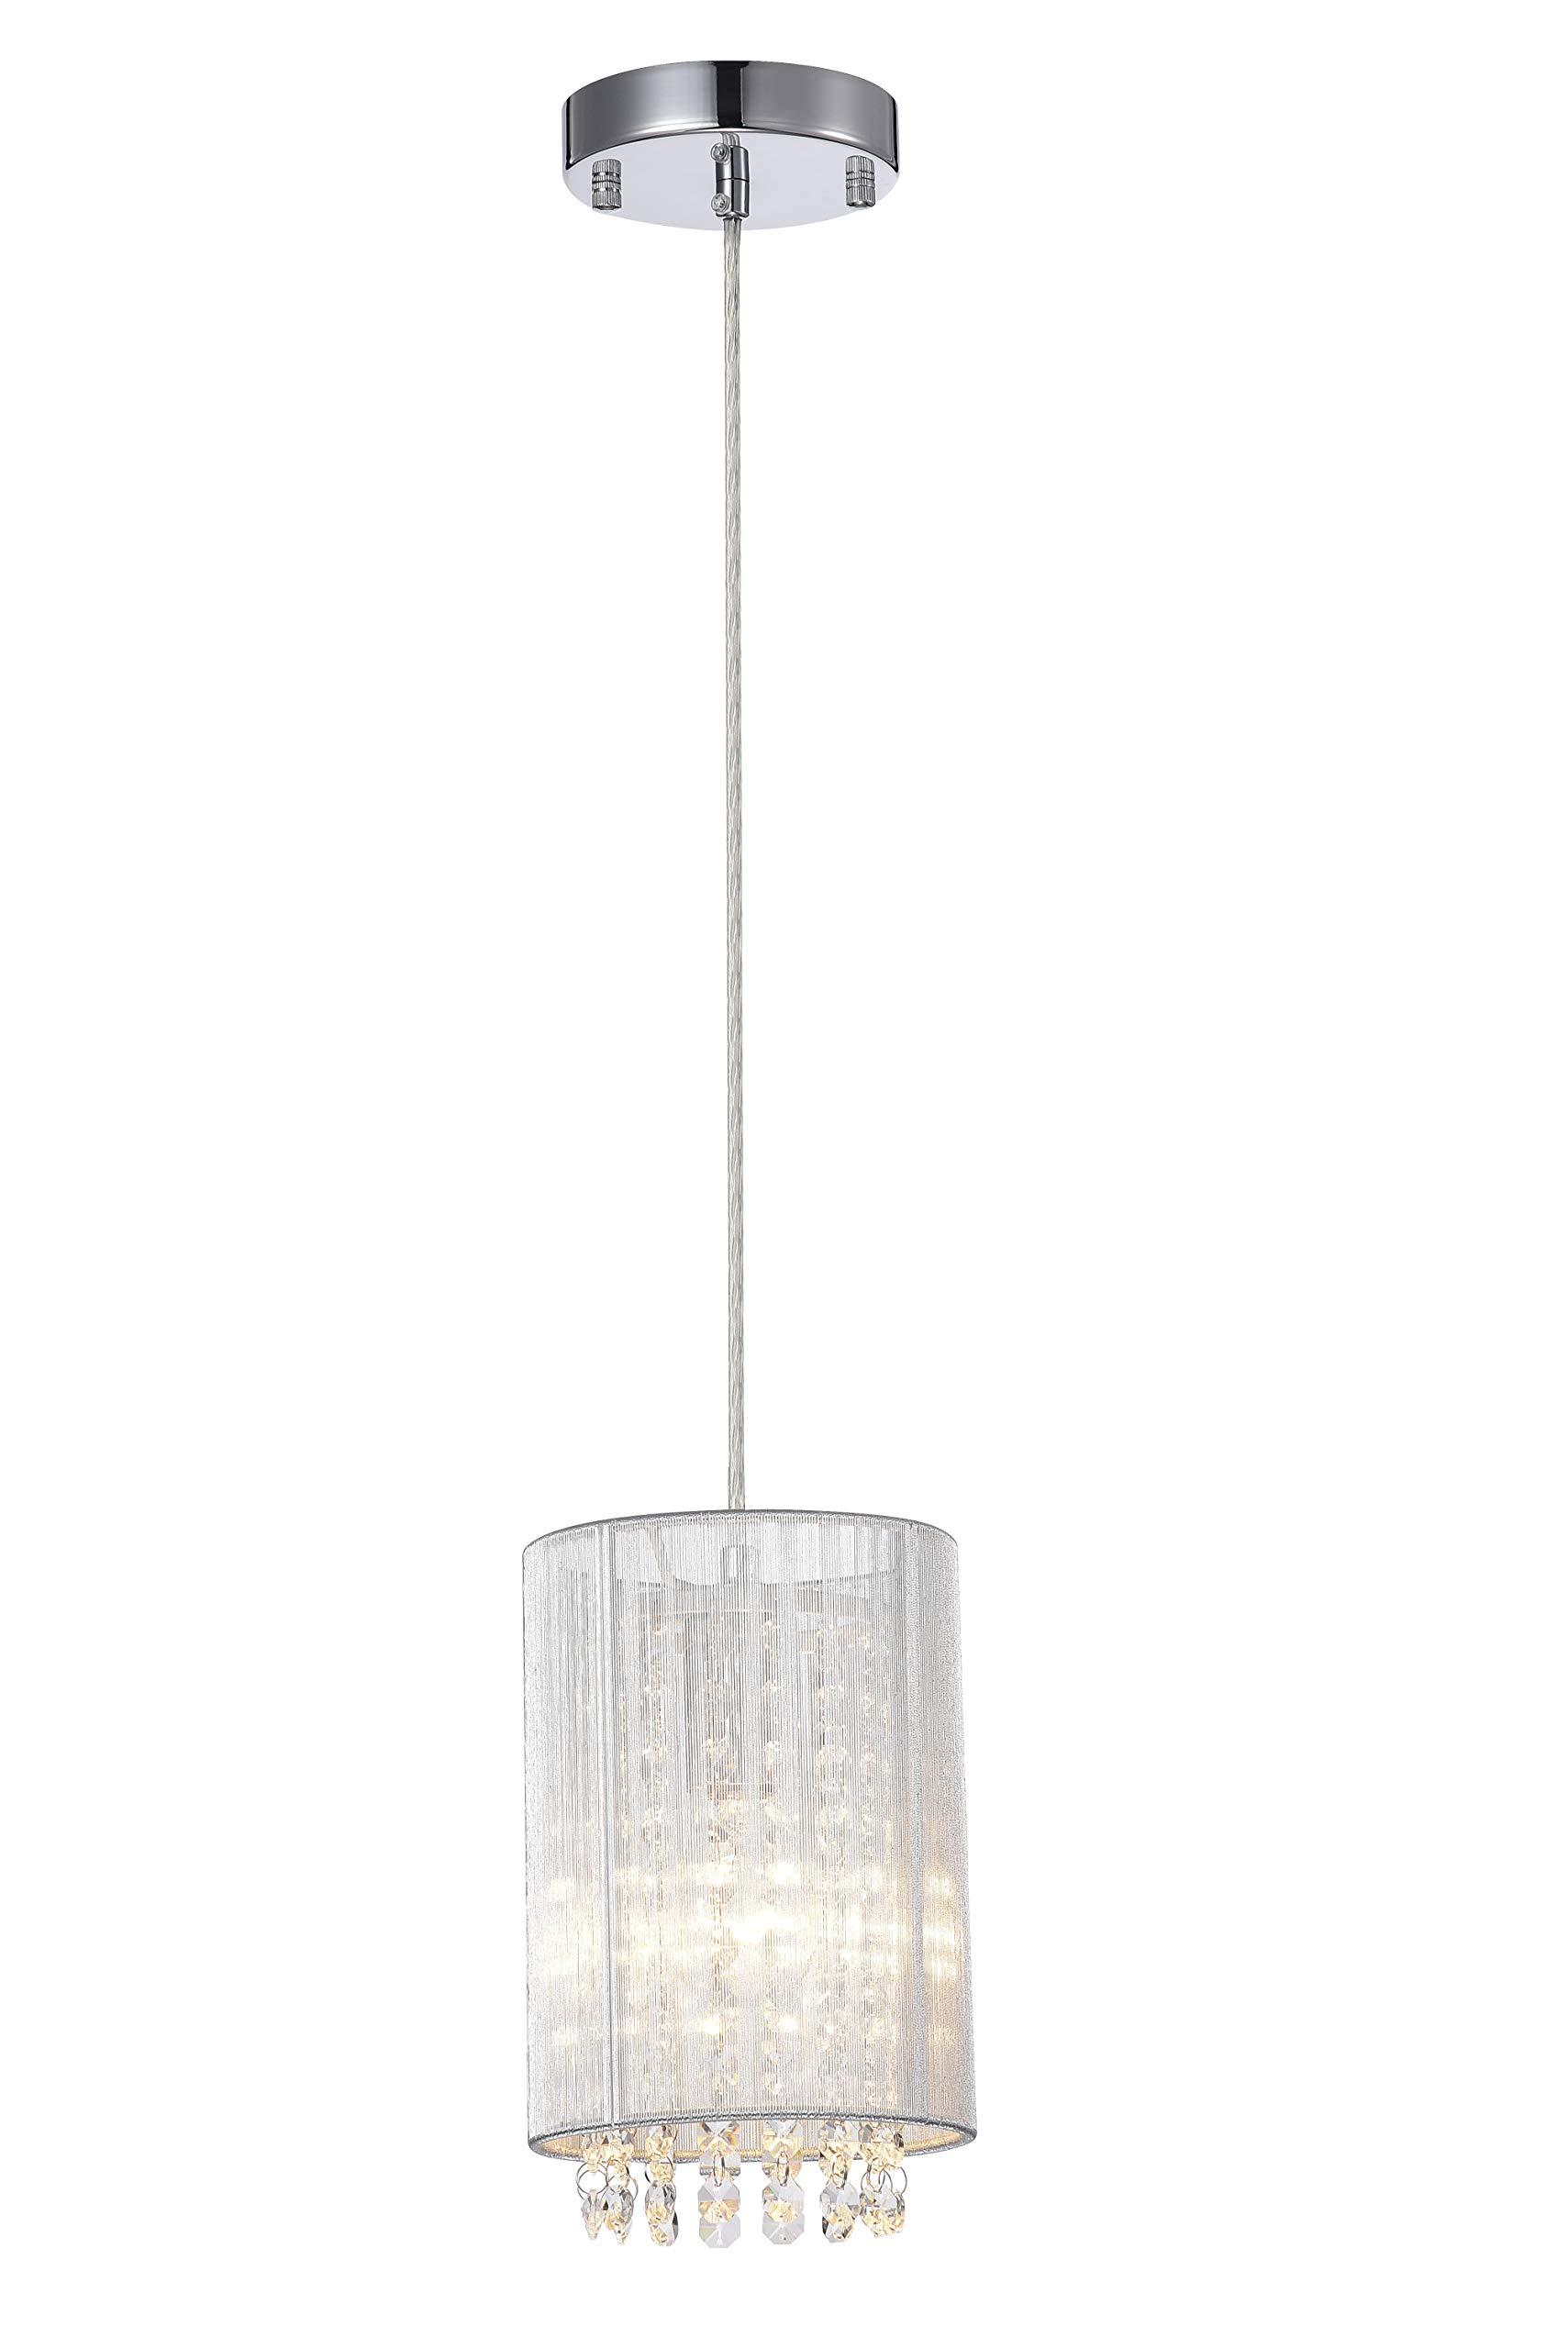 LaLuLa Pendant Lighting Mini Pendant Light Silver Drum Crystal Chandelier 1 Light